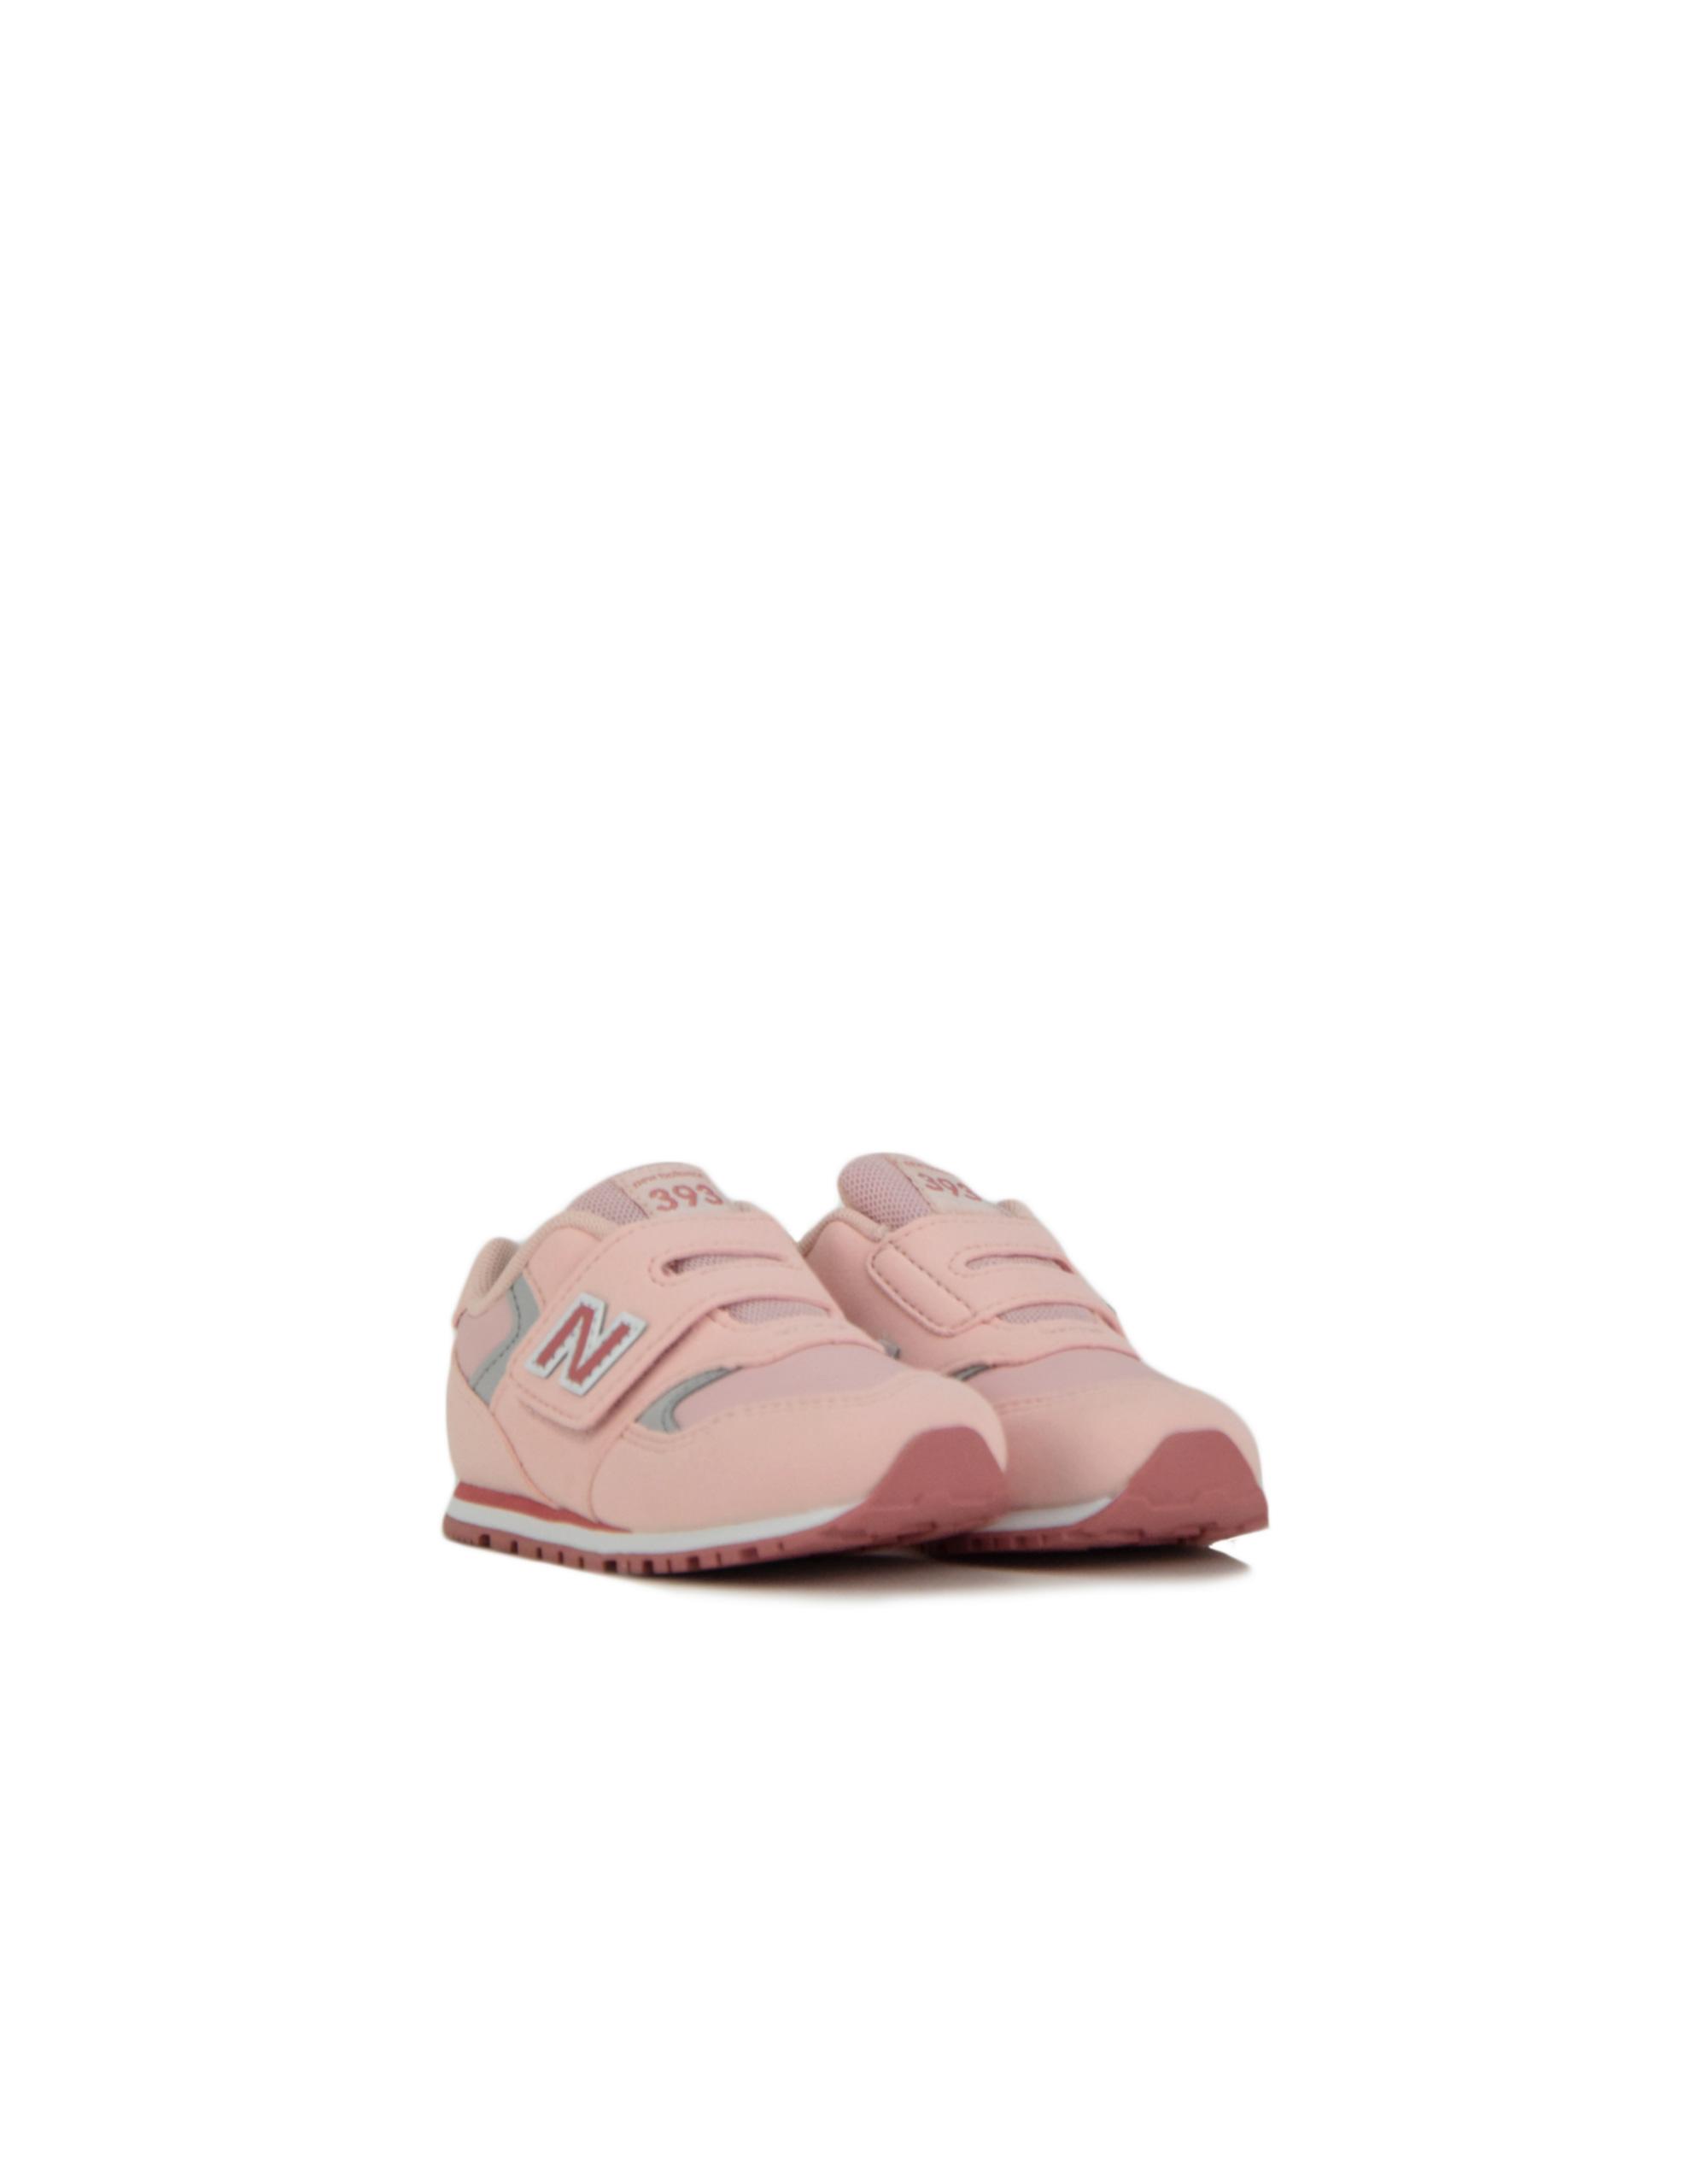 New Balance IV393CPK Pink